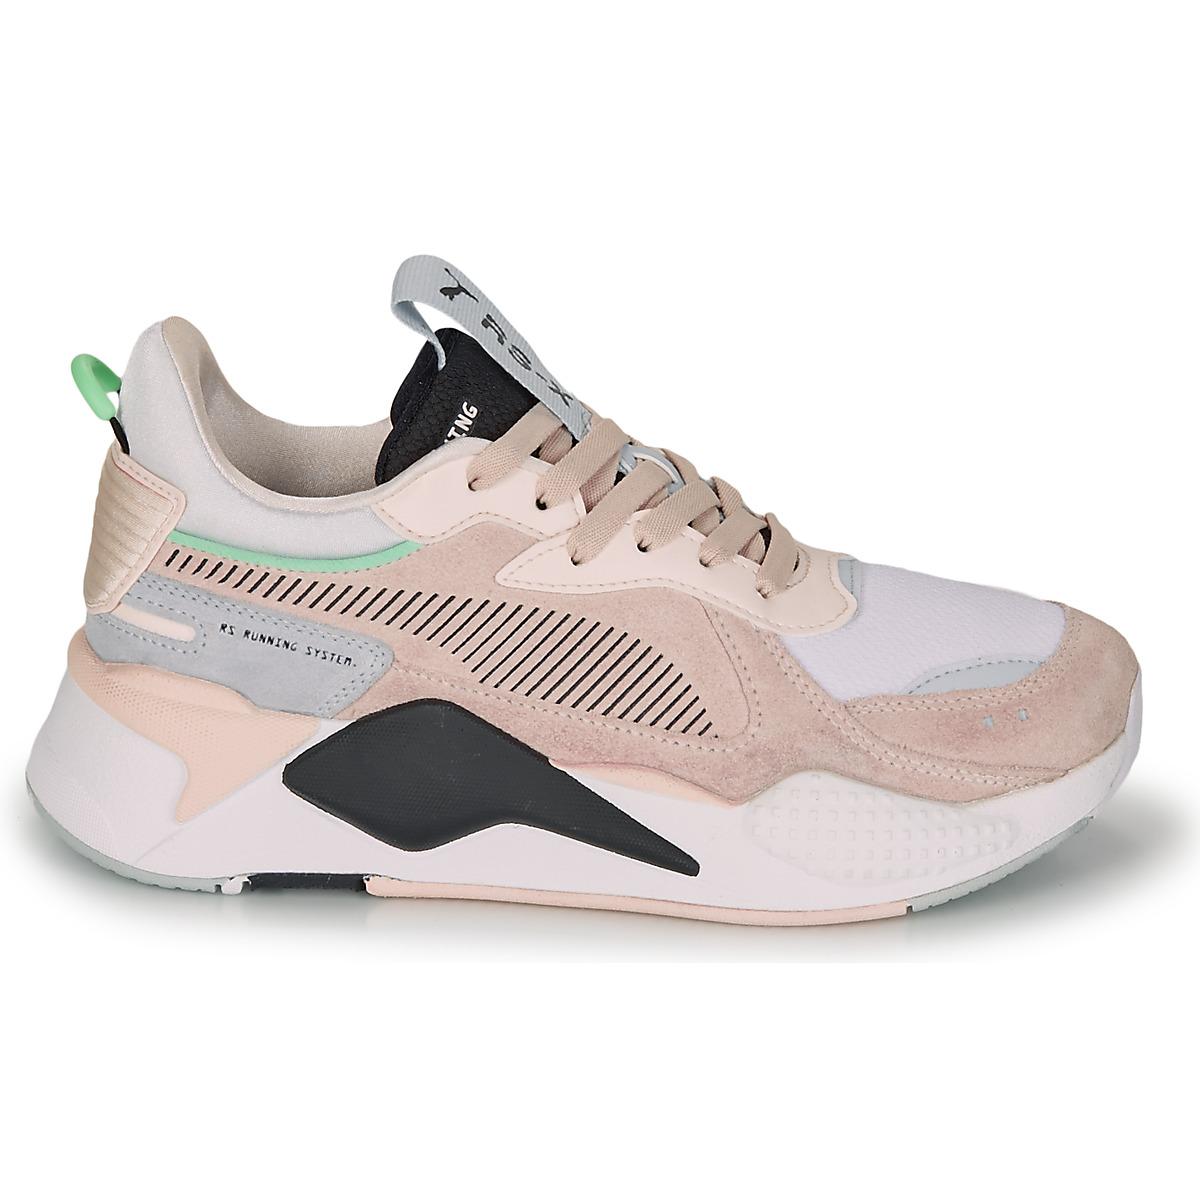 care of by puma donna scarpe